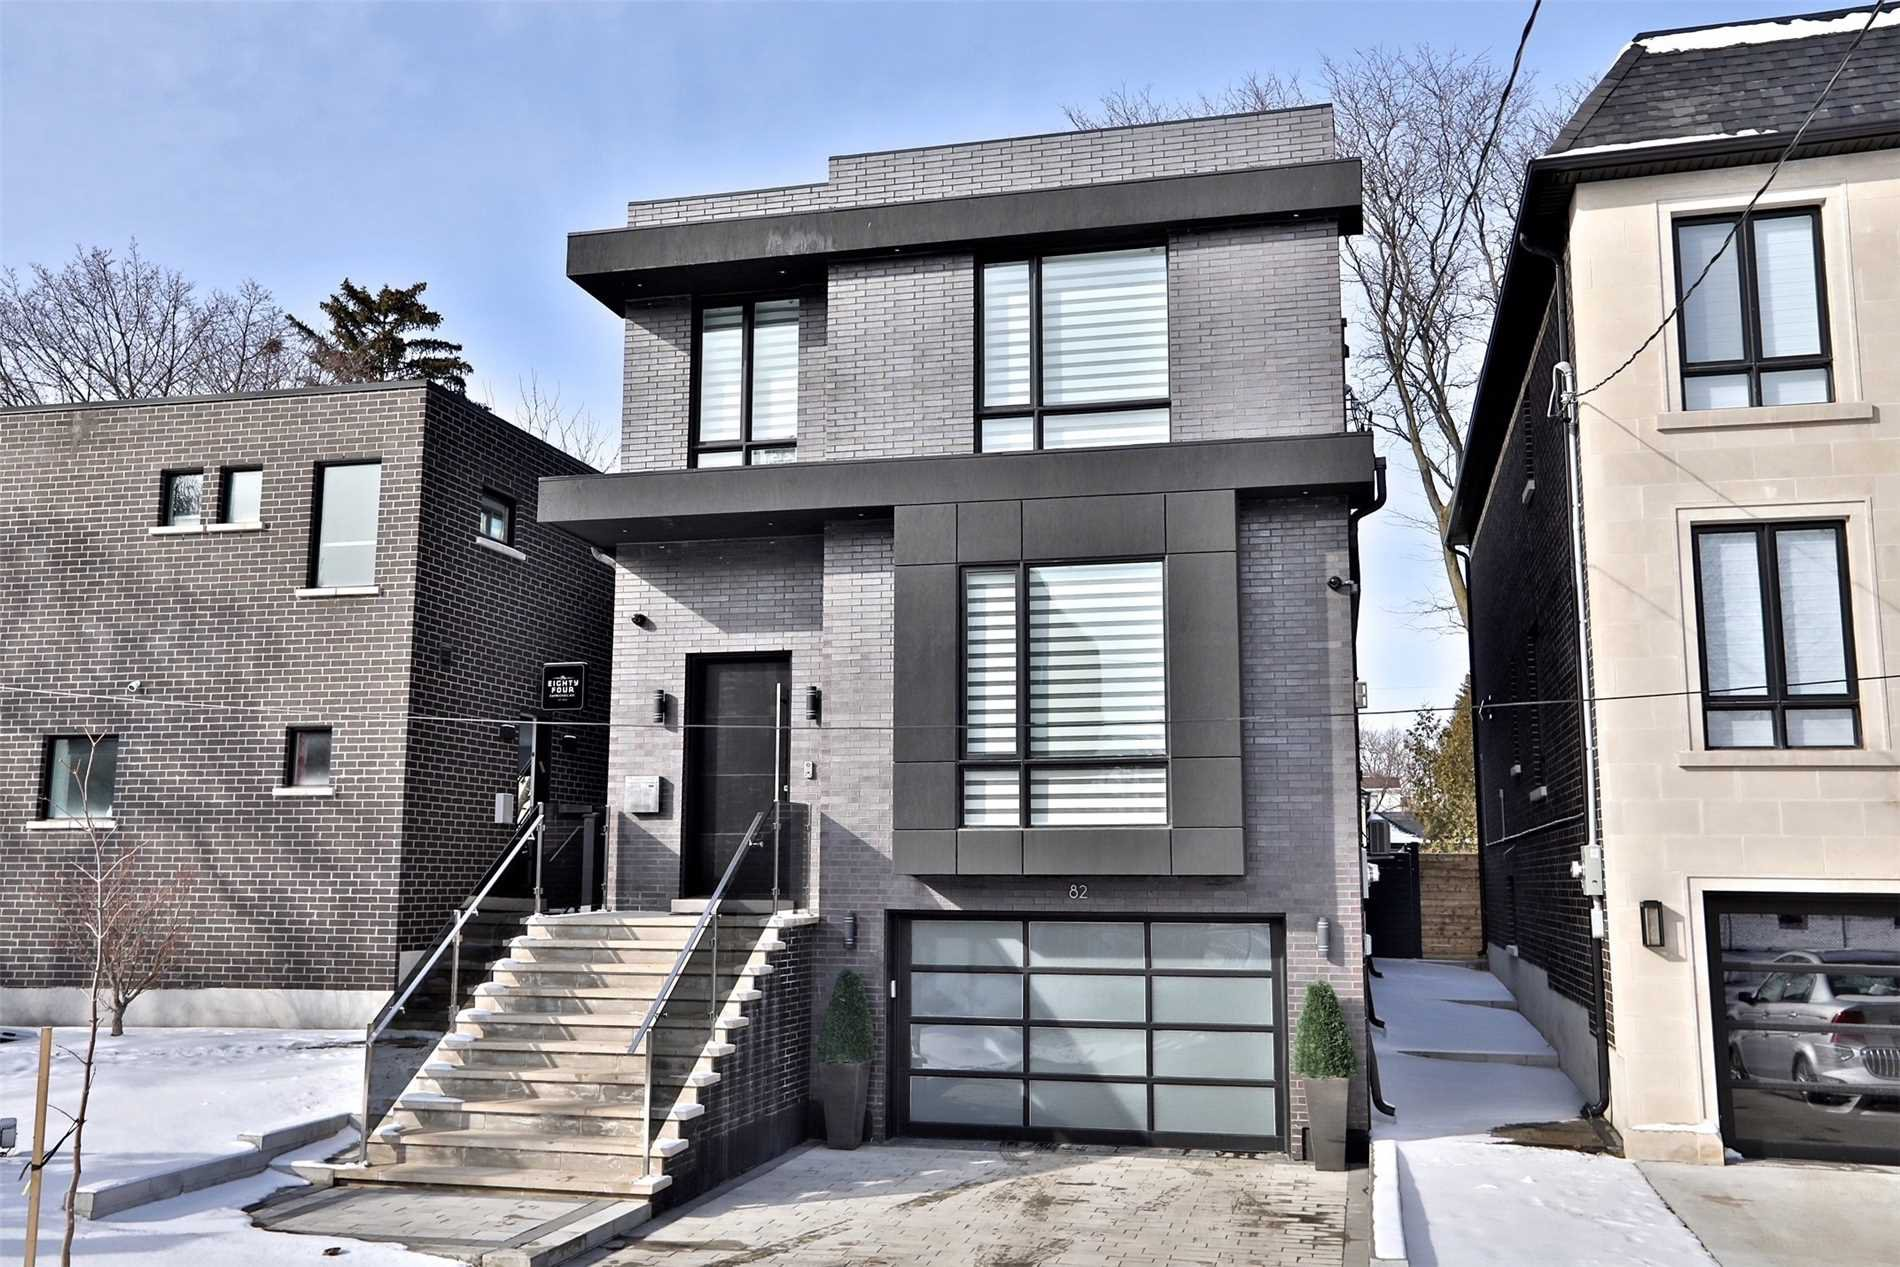 Main Photo: 82 Carmichael Avenue in Toronto: Bedford Park-Nortown House (2-Storey) for sale (Toronto C04)  : MLS®# C4452320